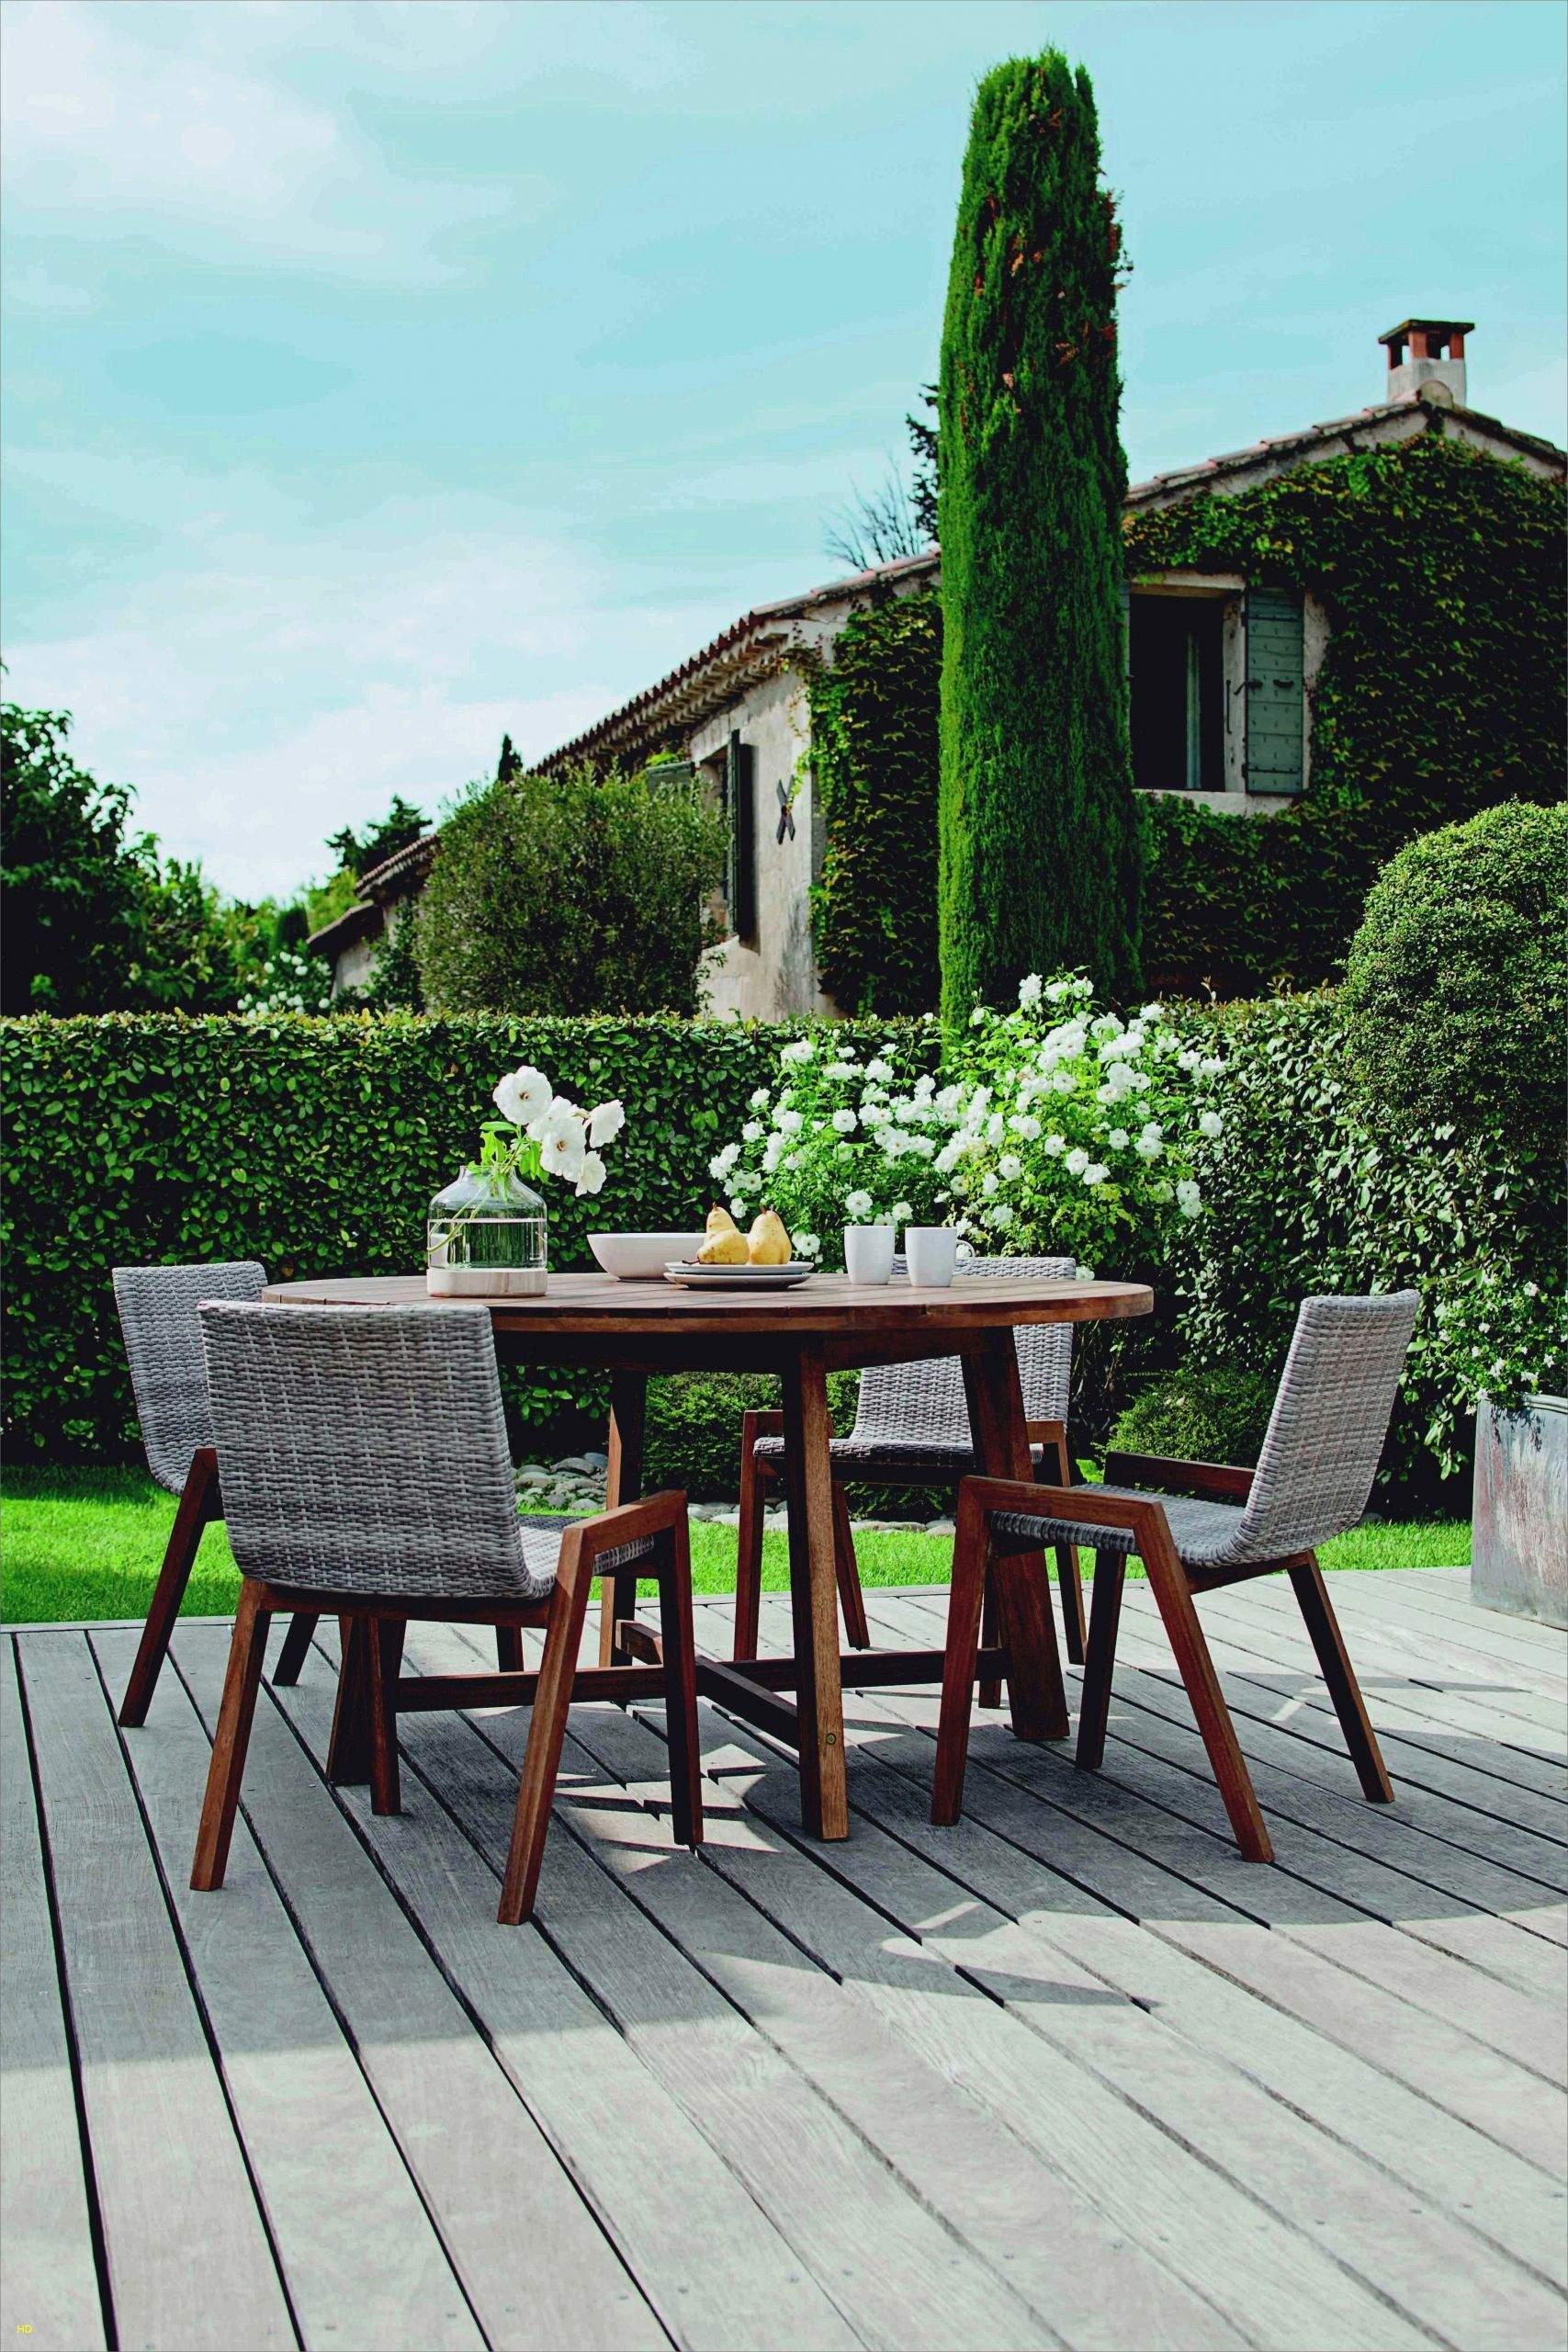 Serre De Jardin Frais 24 Inspirant Salon De Jardin Moins ... destiné Salon De Jardin En Teck Pas Cher